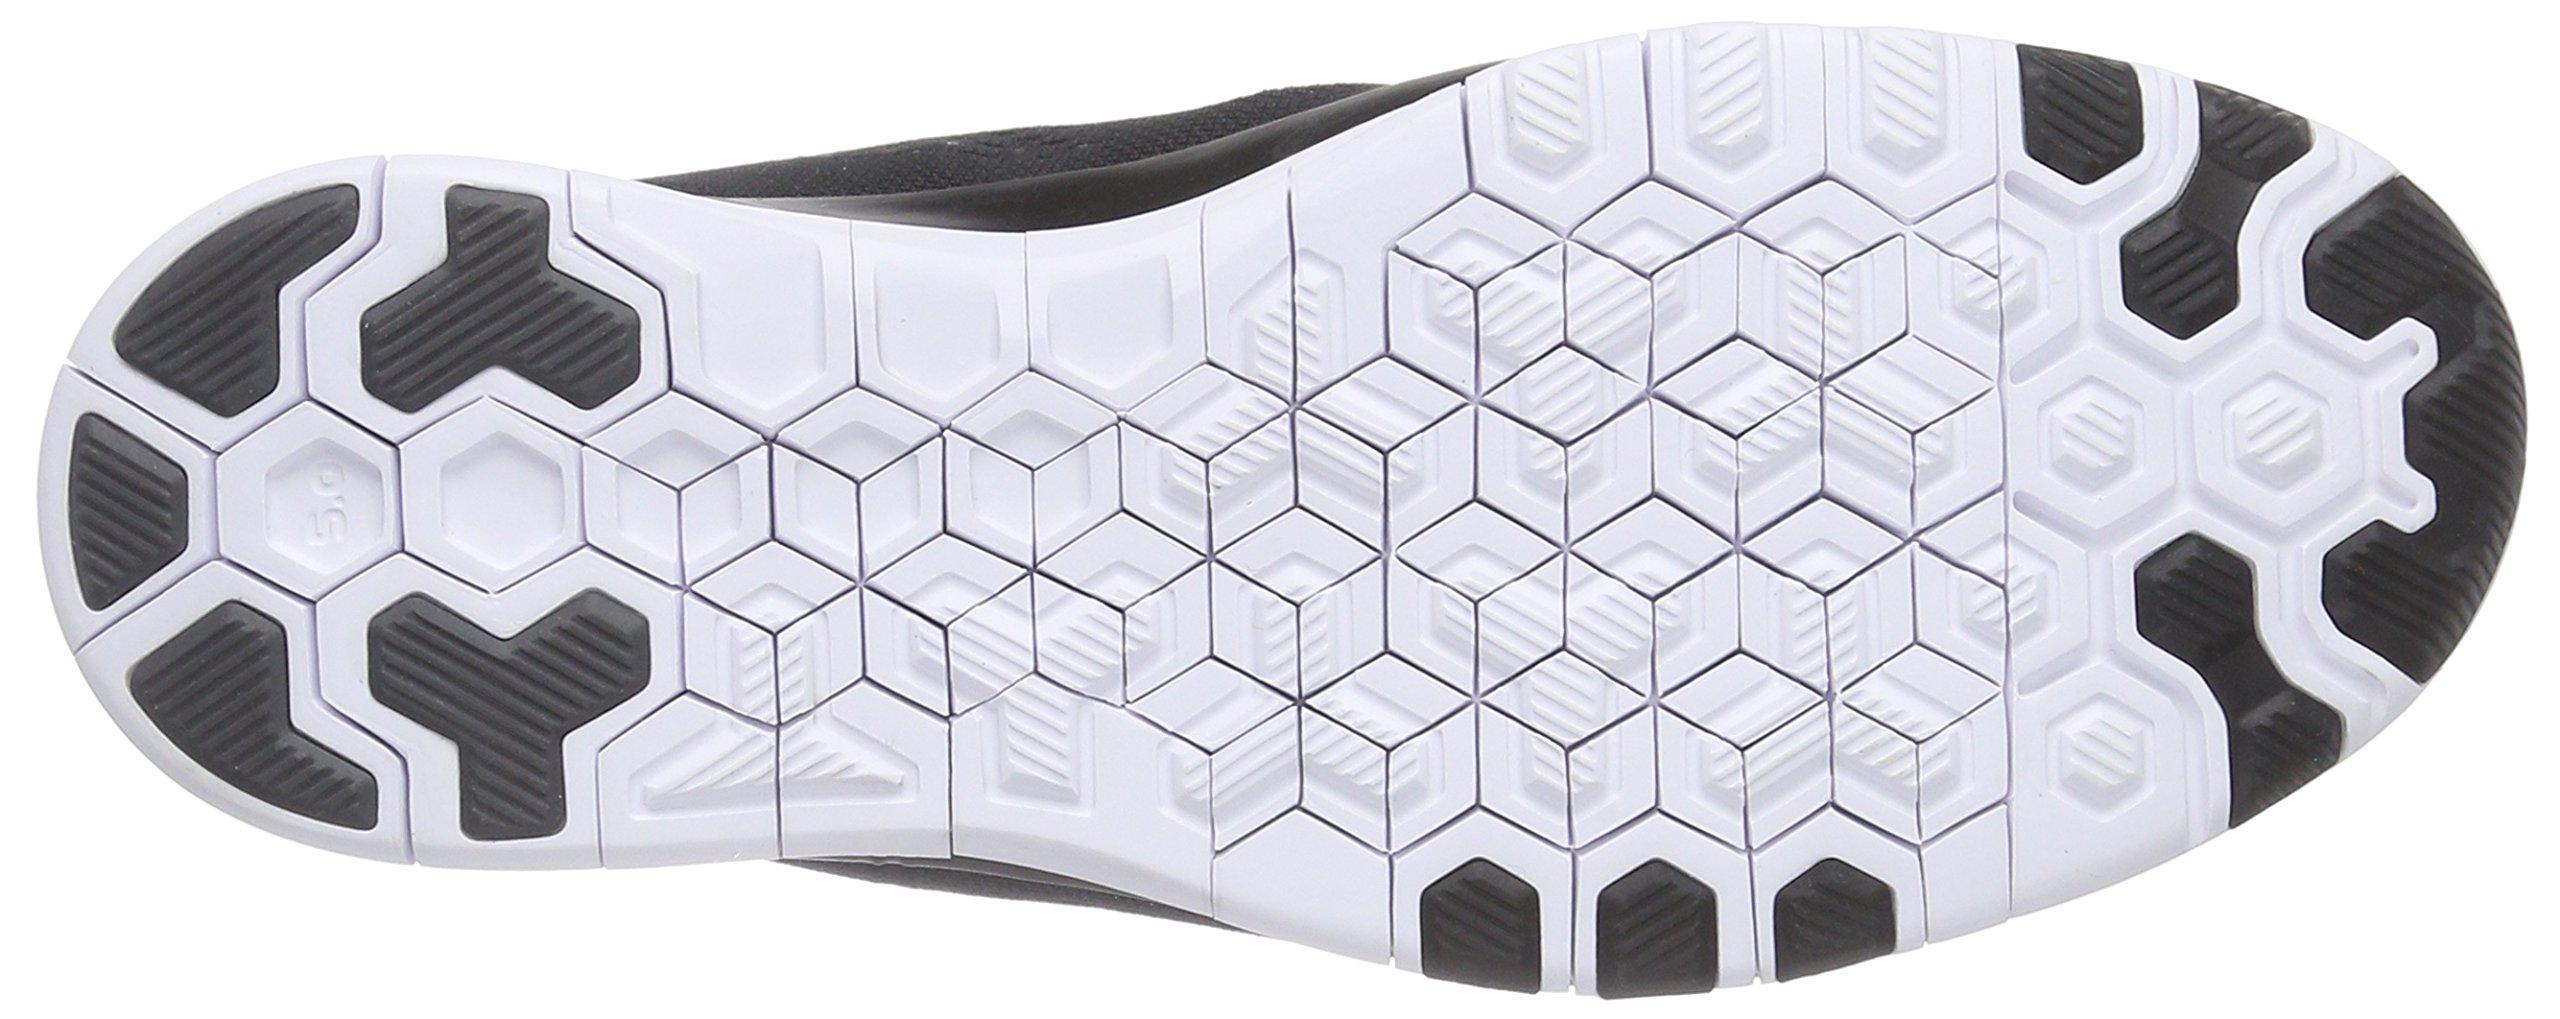 Nike Womens Free 5.0 Tr Fit 5 Black/White/Dark Grey/White Training Shoe 5 Women US by Nike (Image #3)